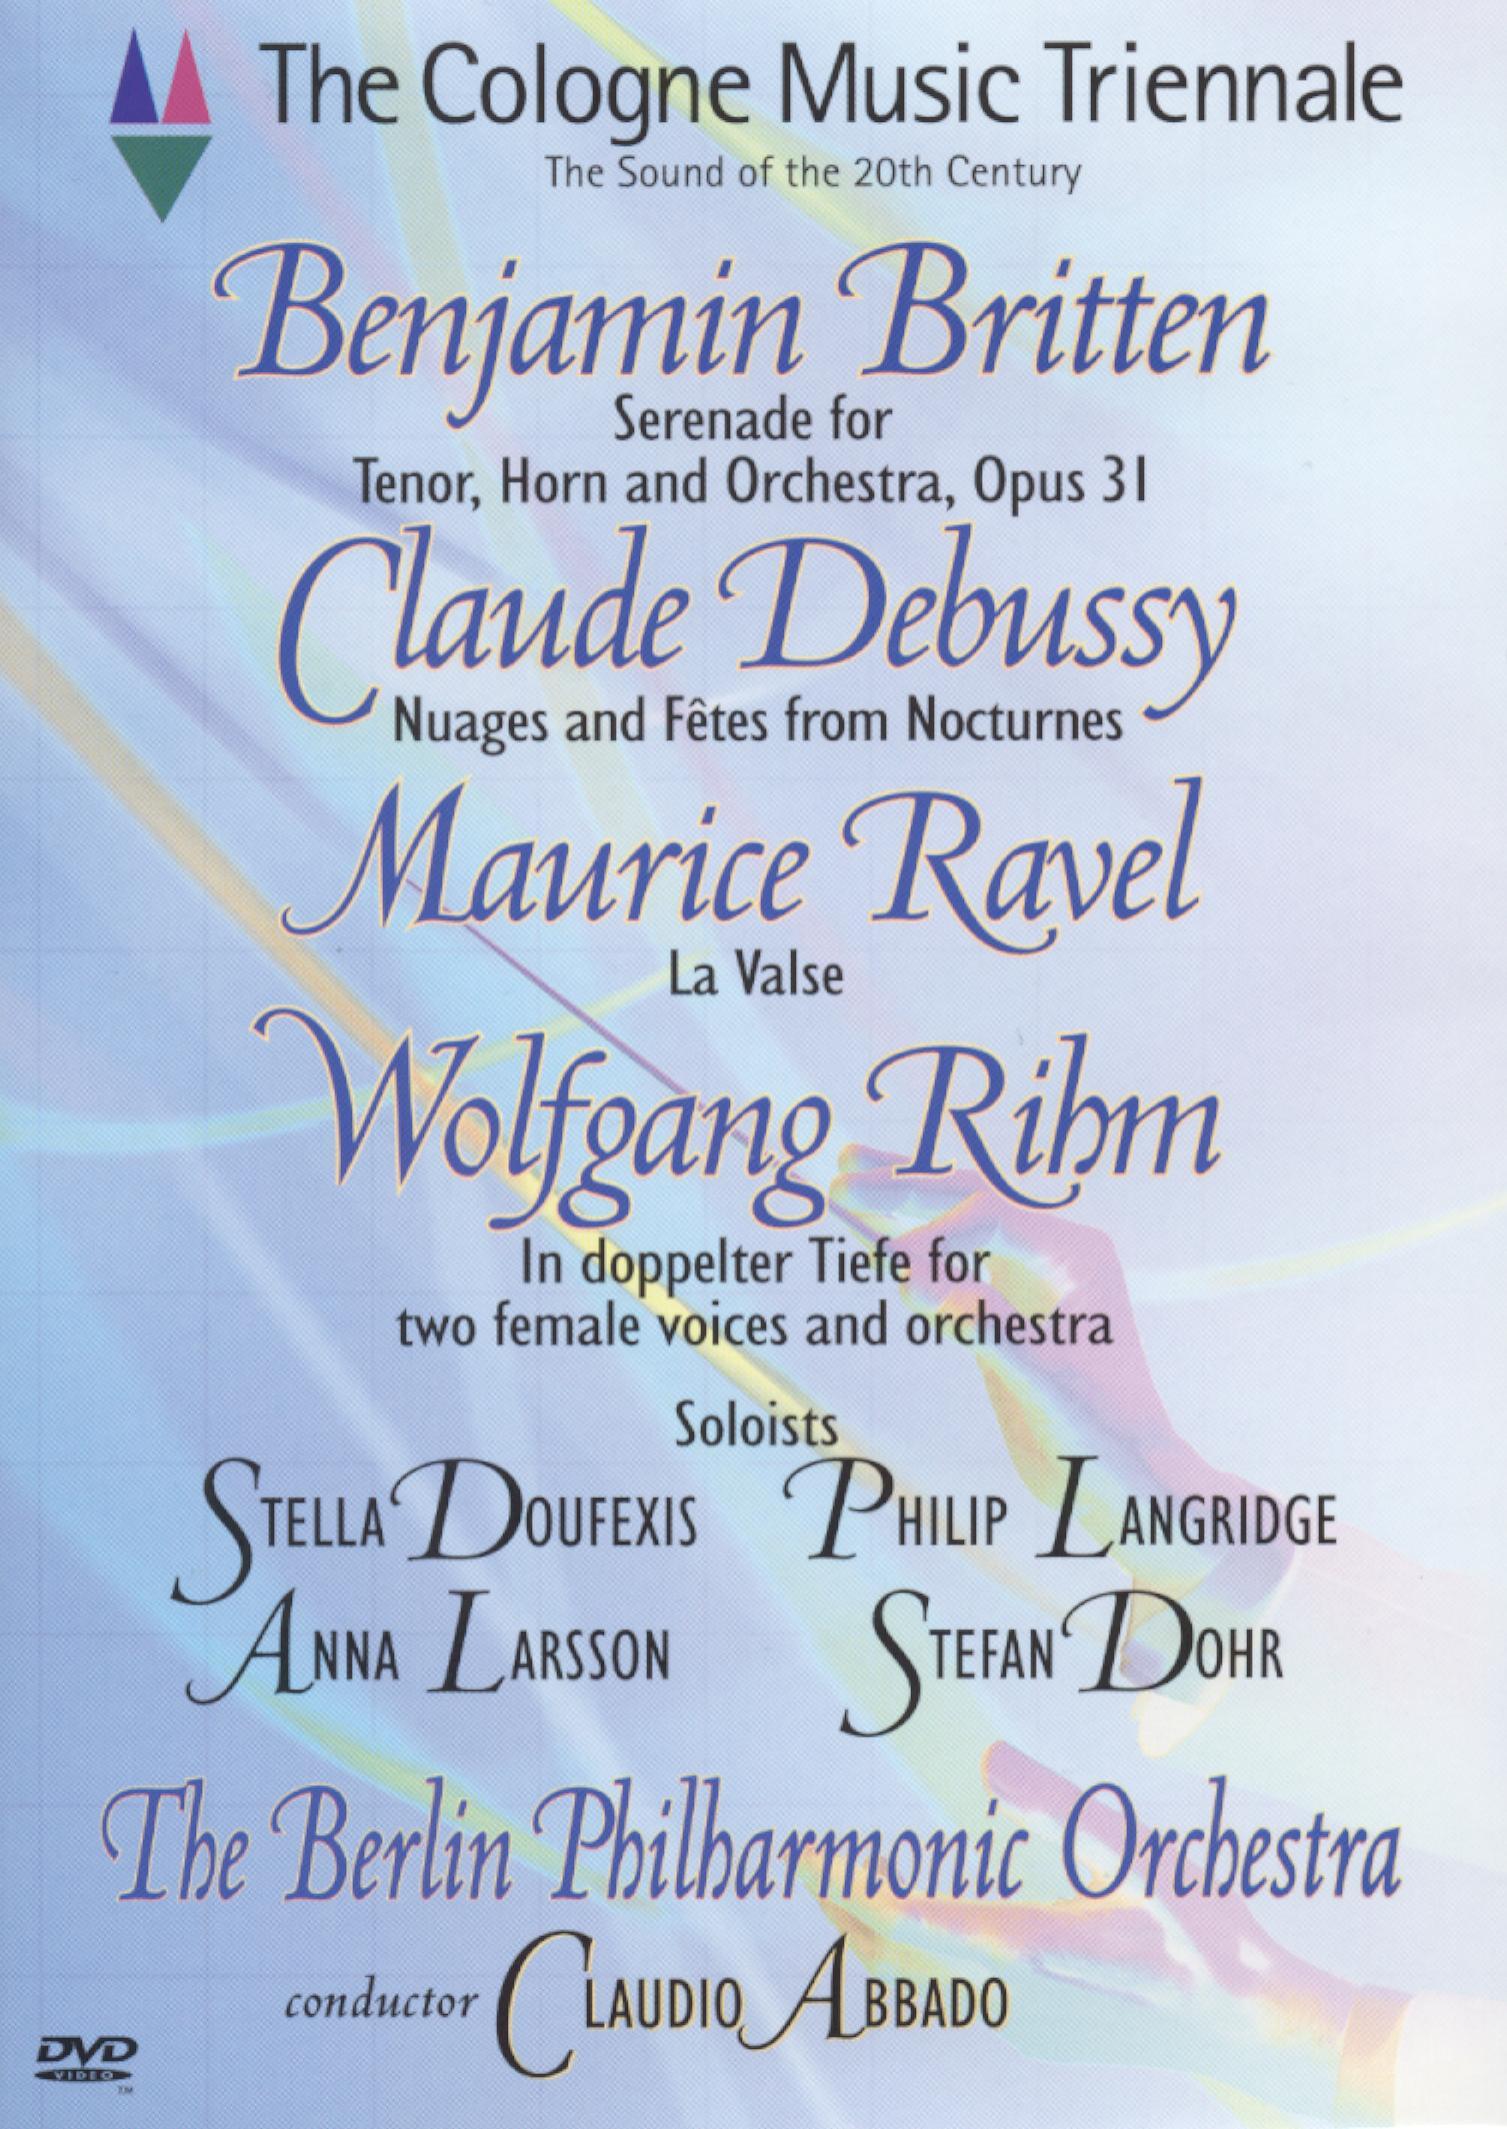 Cologne Music Triennale: Britten/Dedussy/Ravel/Rihm